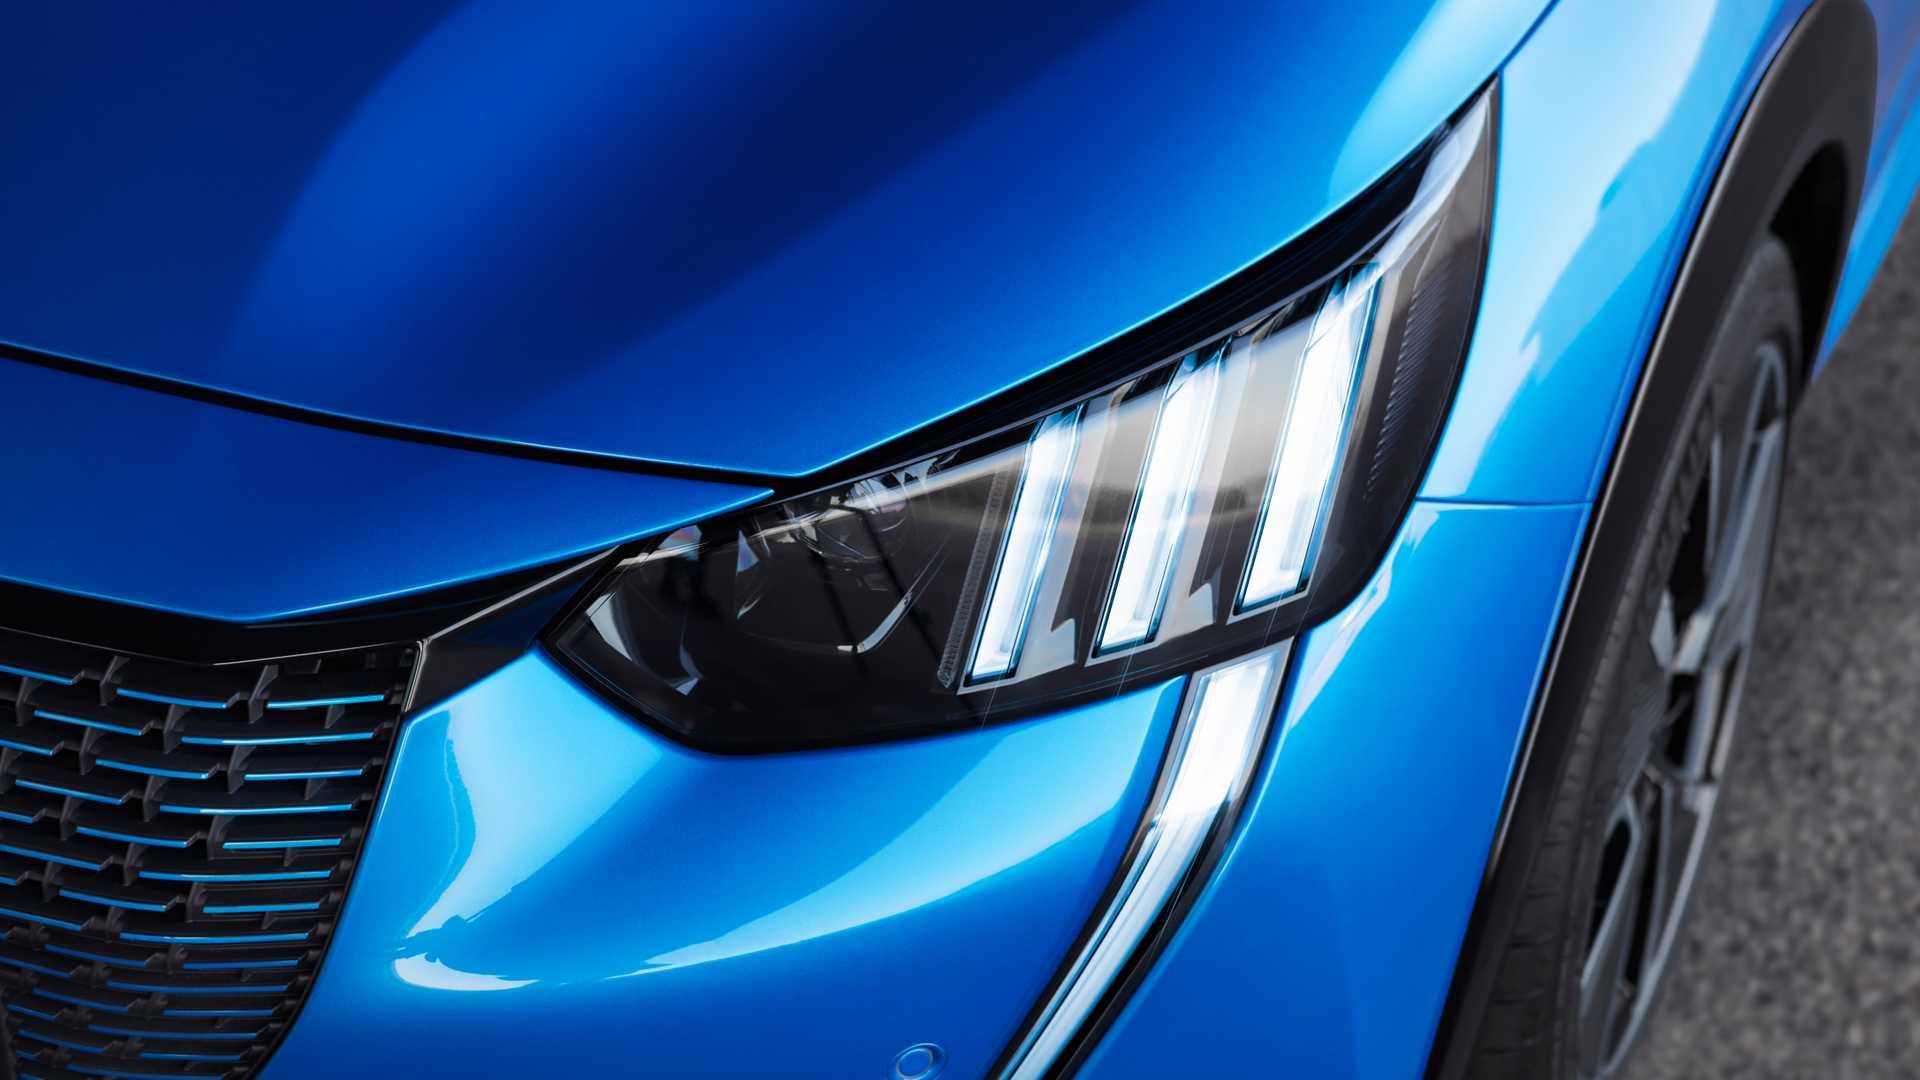 2020 Peugeot e-208 EV Headlight Wallpaper (15)